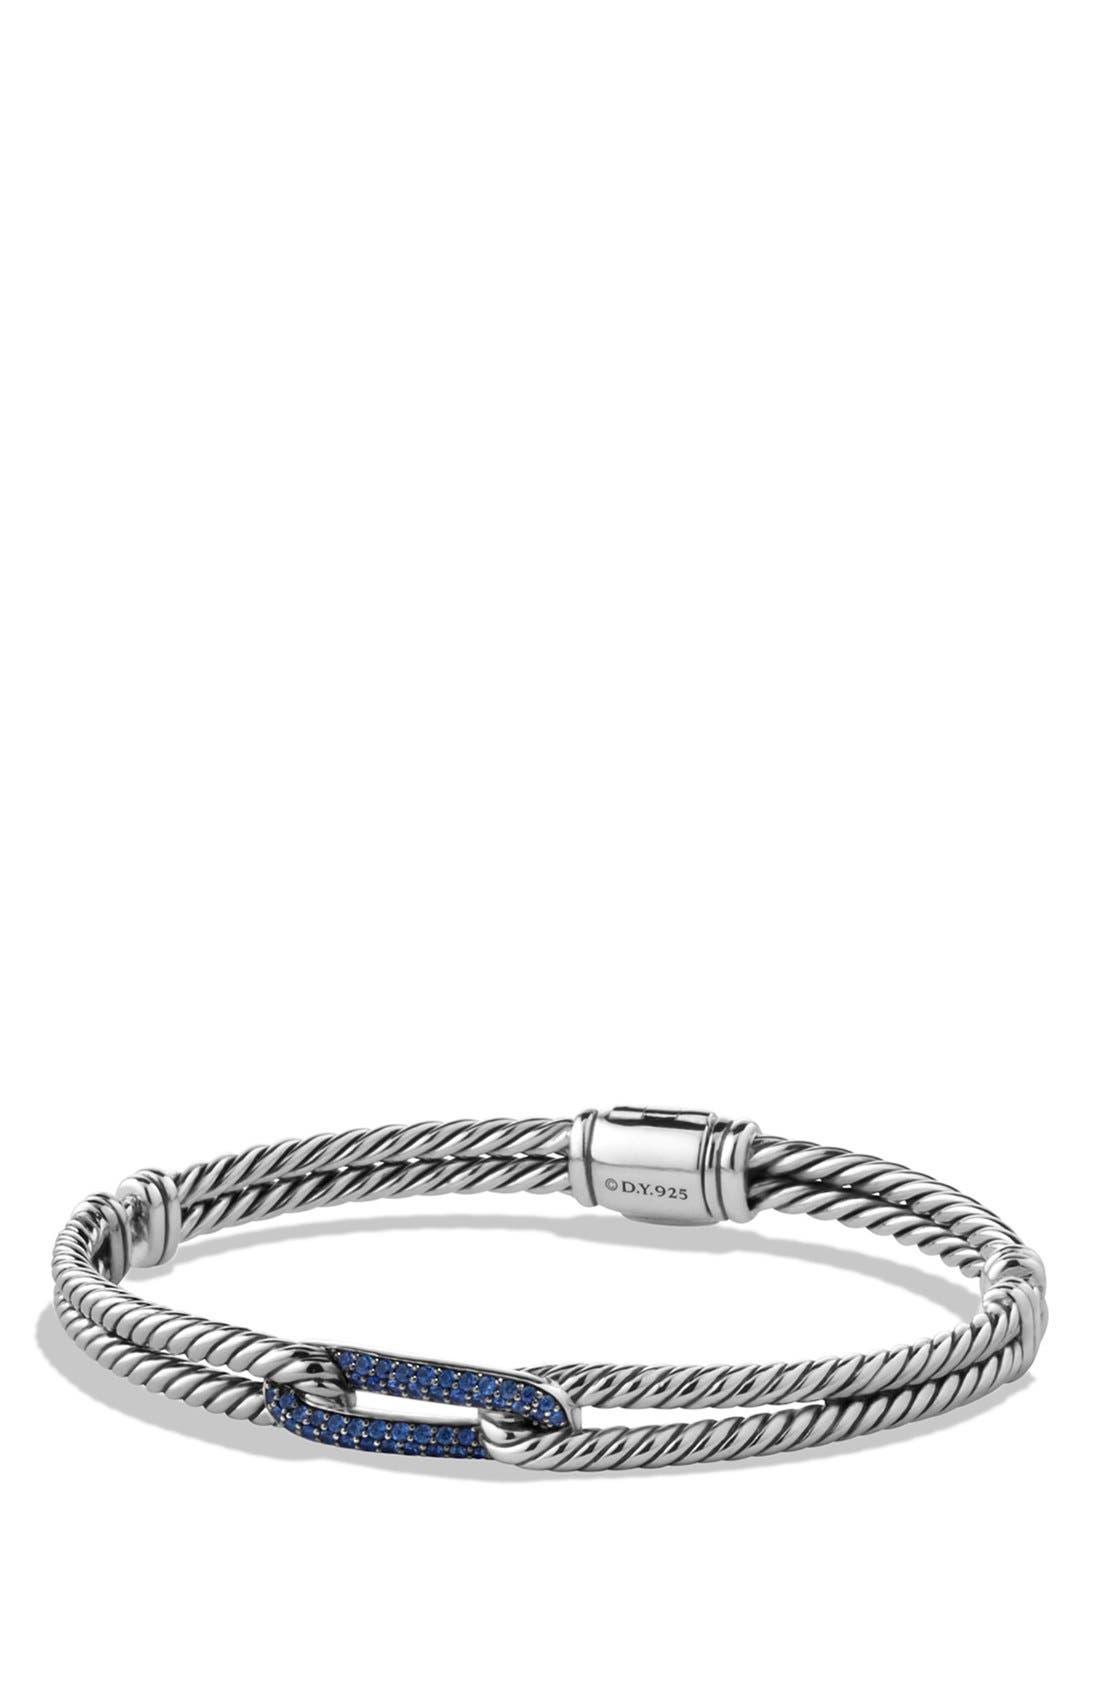 DAVID YURMAN Labyrinth Petite Pavé Single-Loop Bracelet with Sapphires